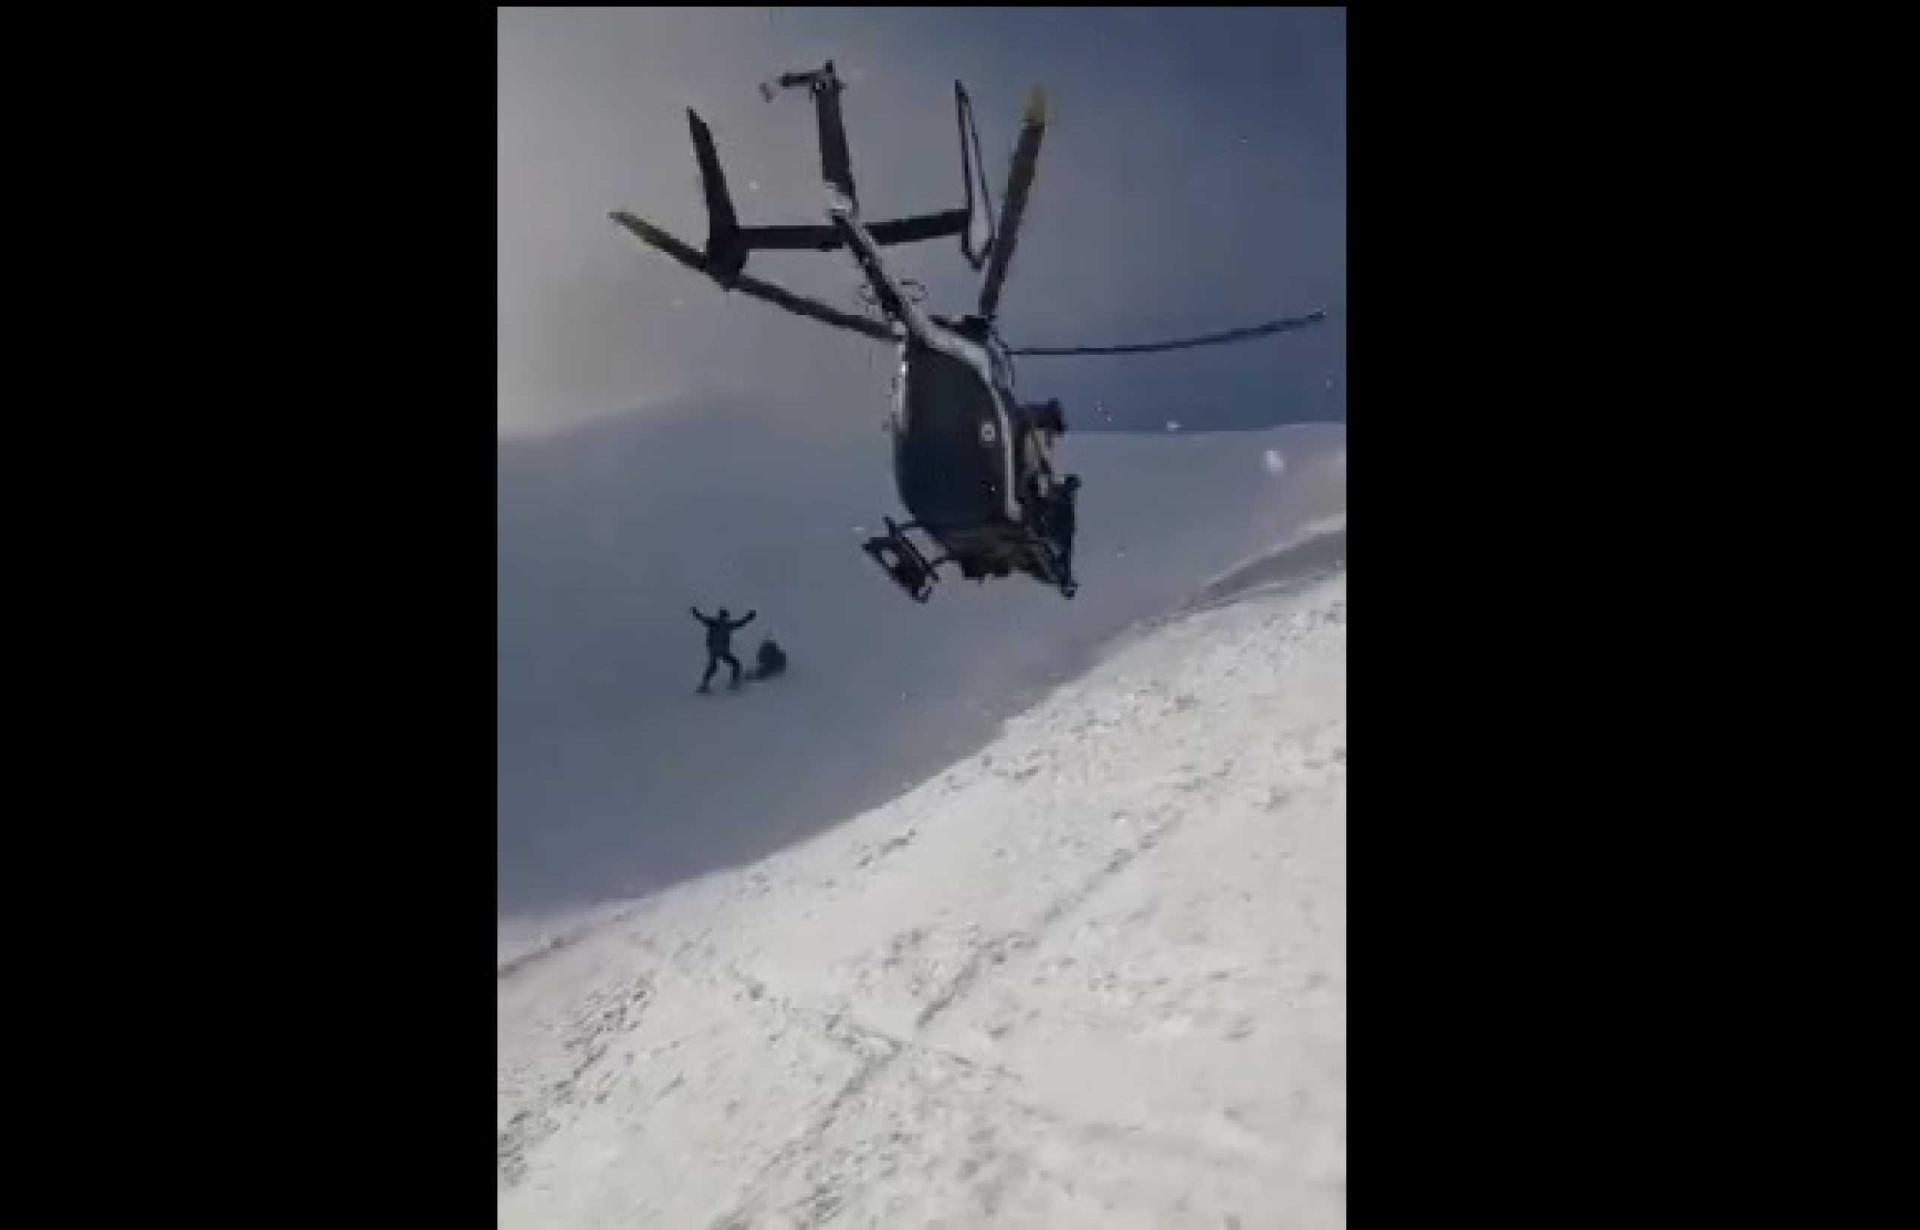 Piloto de helicóptero torna-se protagonista de resgate nos Alpes